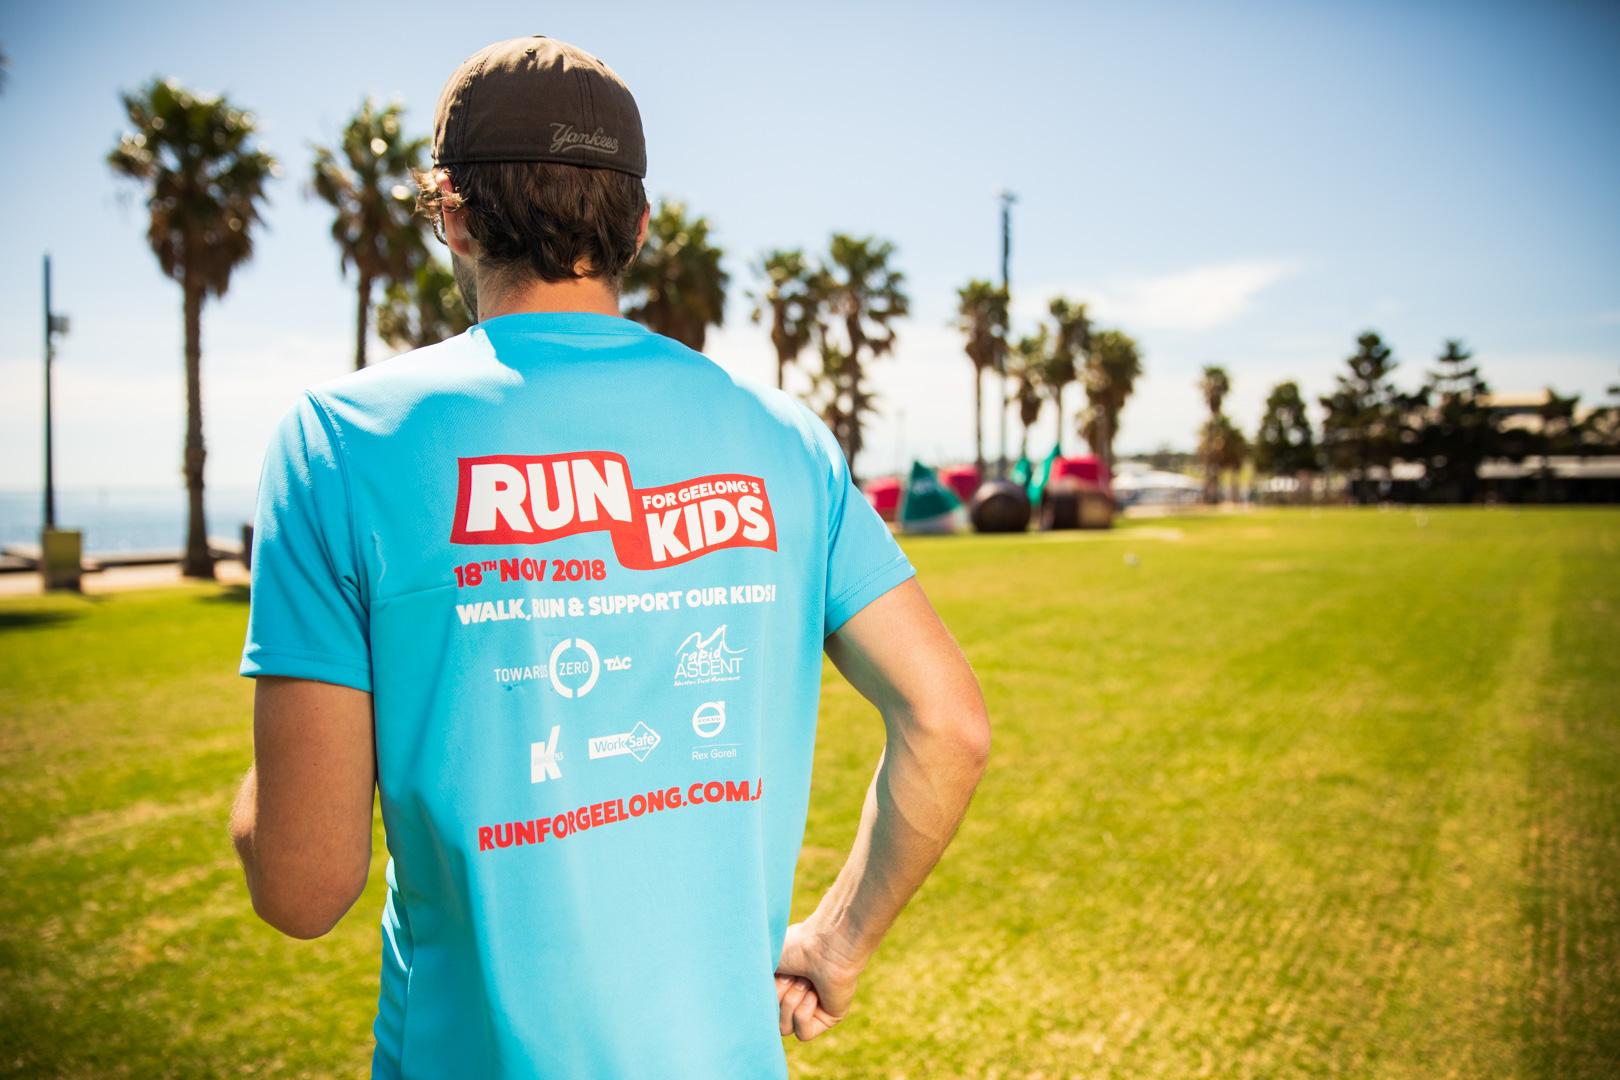 Run for Geelong's Kids - Photography